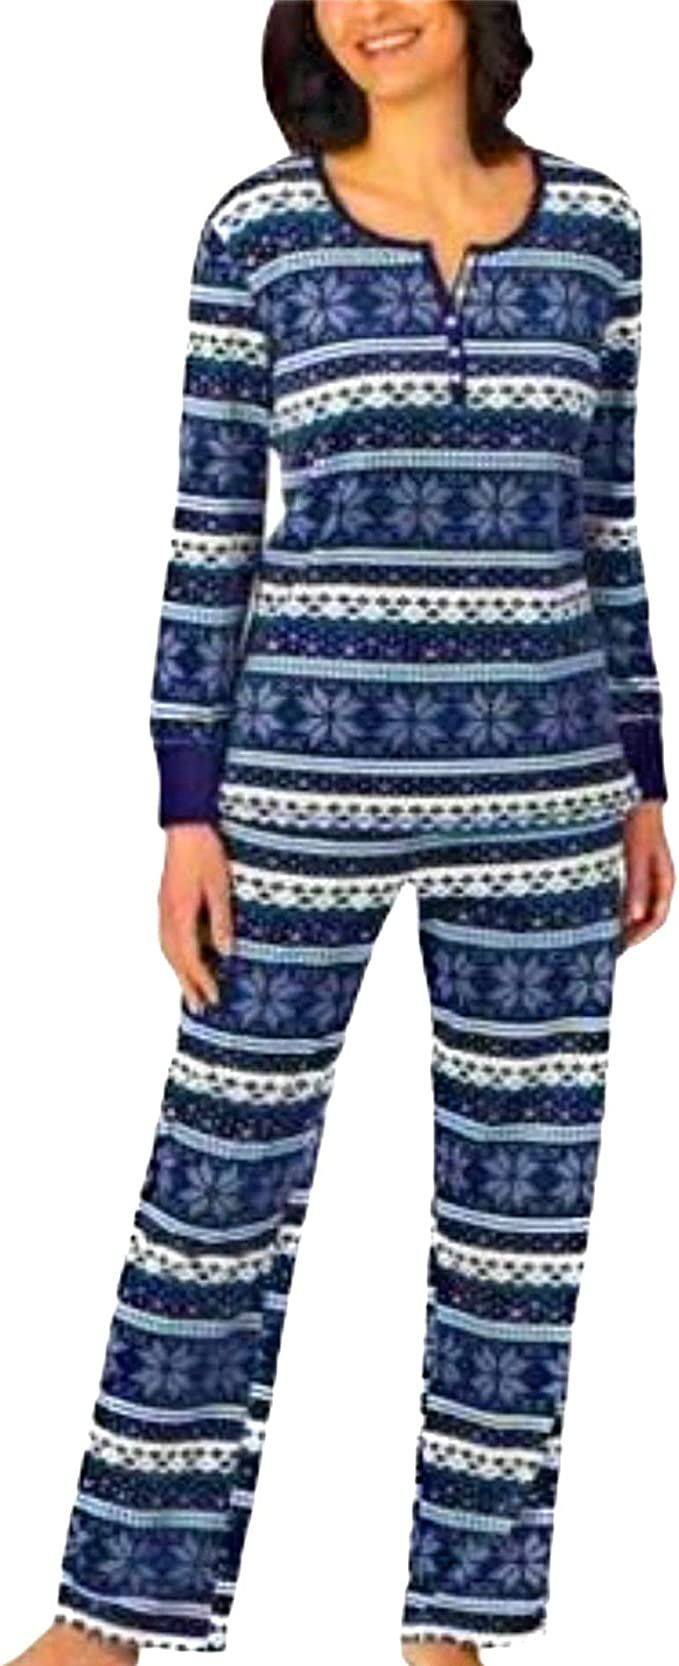 WOMENS NAUTICA 2 Piece PAJAMA LOUNGE SET MICROFLEECE polka dots Plaid stripes PJ